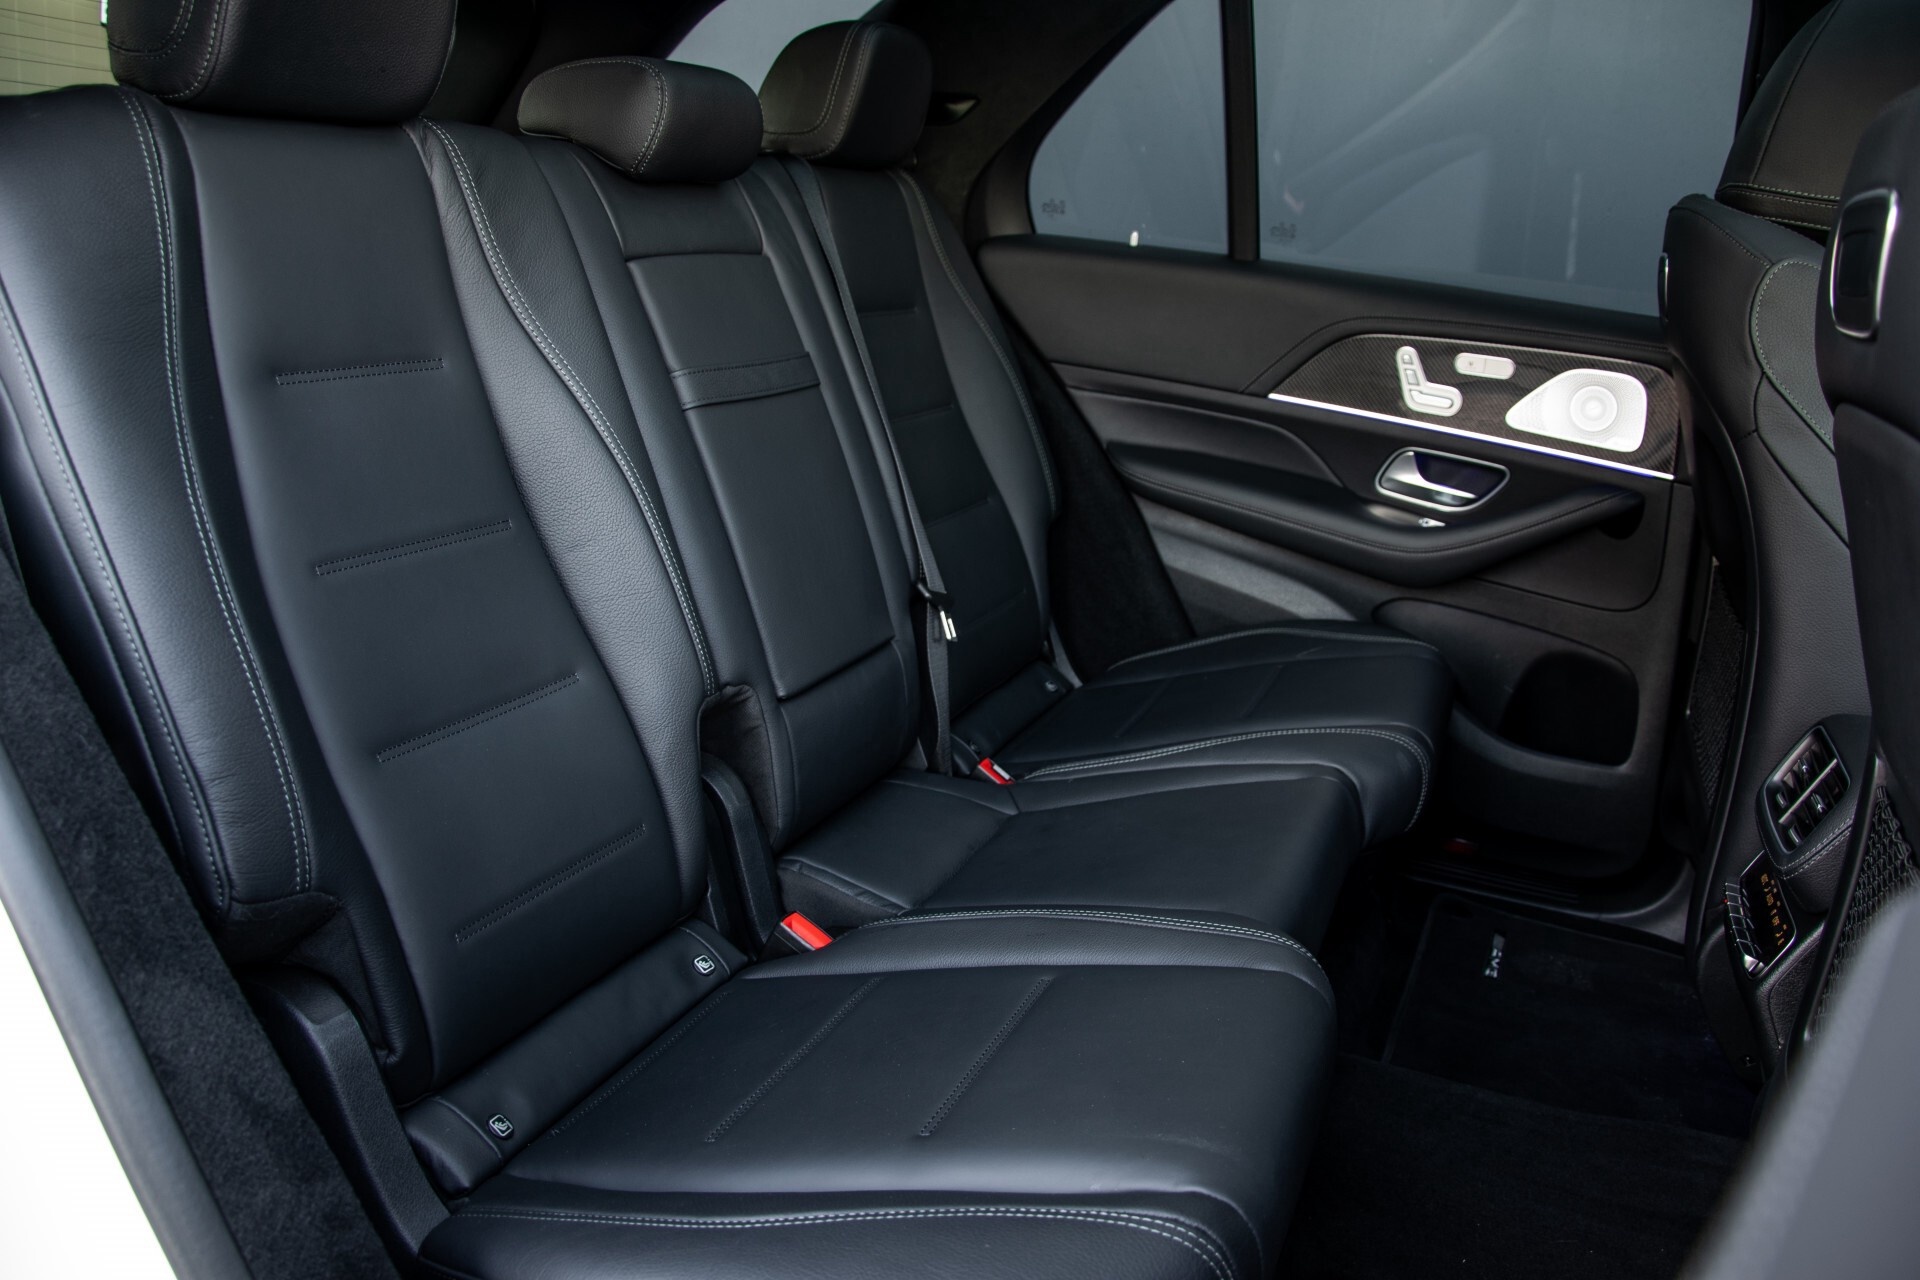 Mercedes-Benz GLE 450 4-M AMG Night/Carbon/Designo/Standkachel/Rij-assist/Keyless/Burmester Aut9 Foto 4